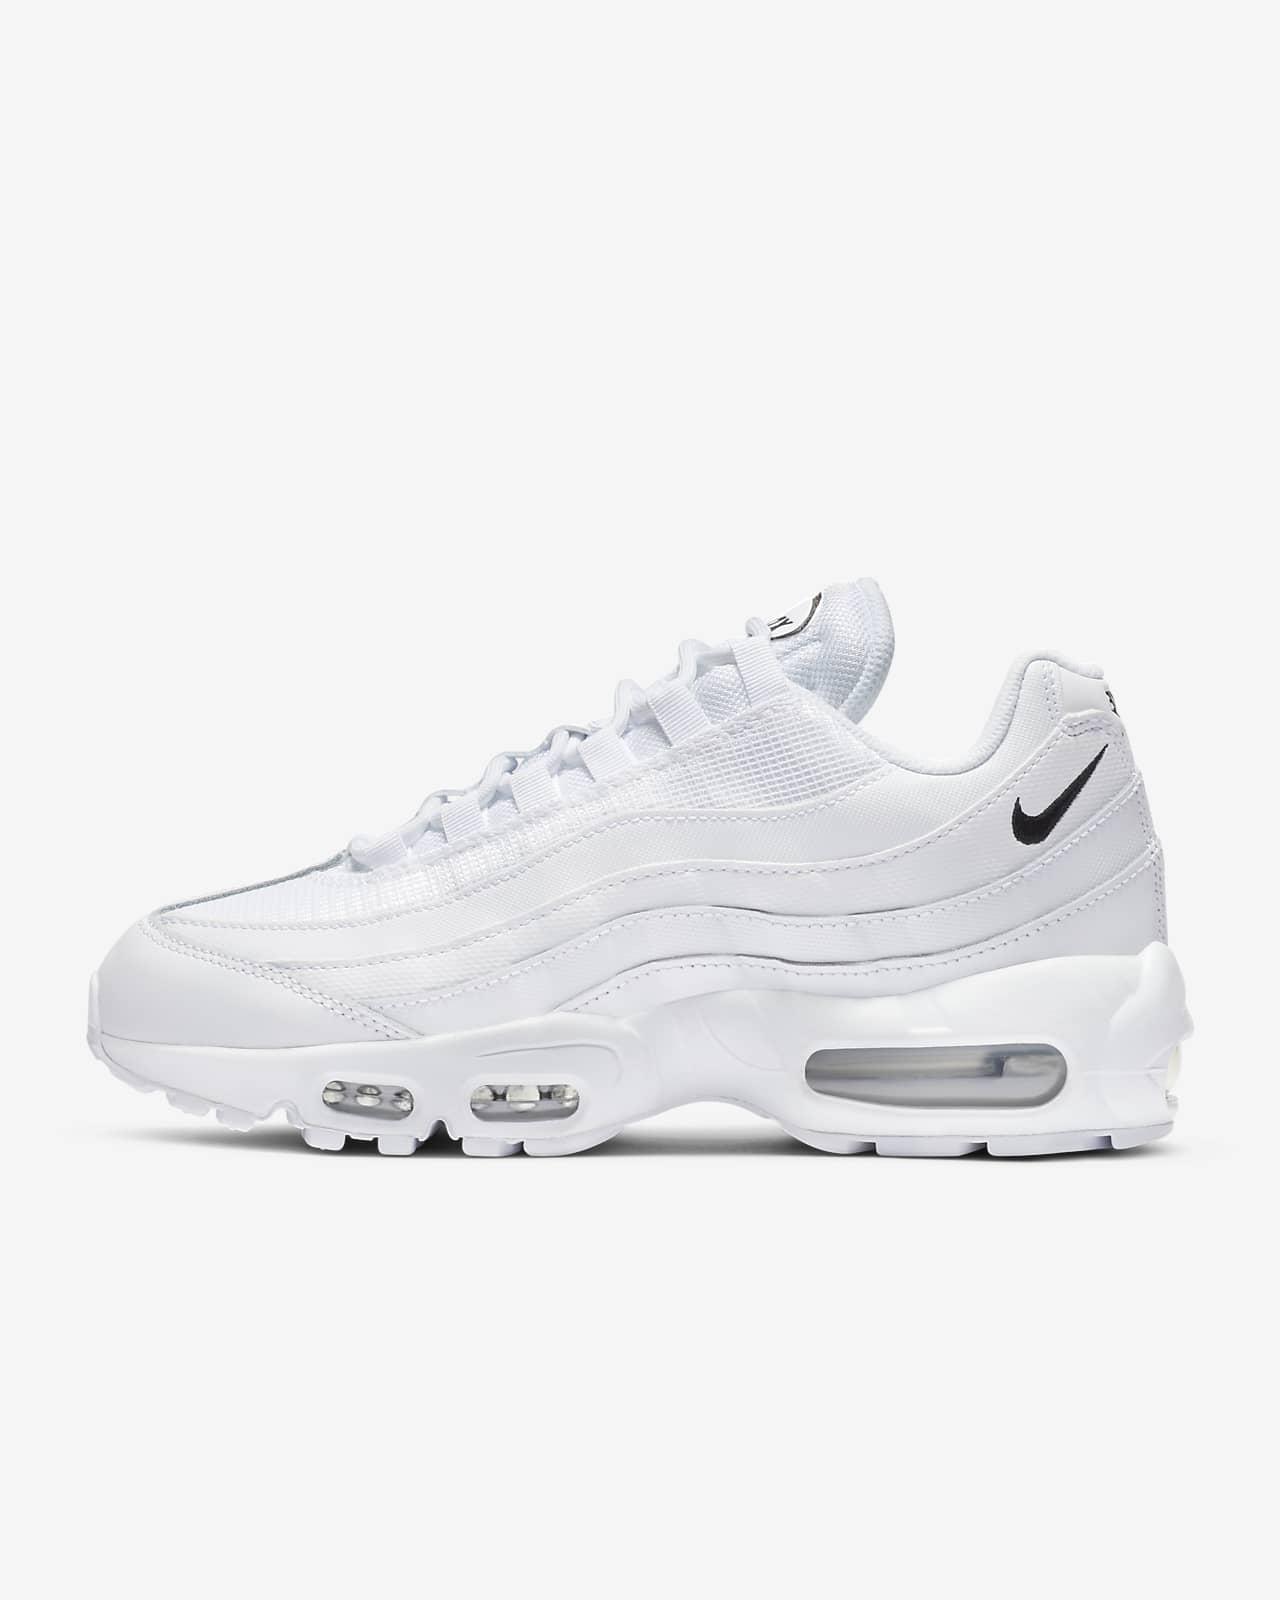 Nike Air Max 95 Essential Women's Shoes